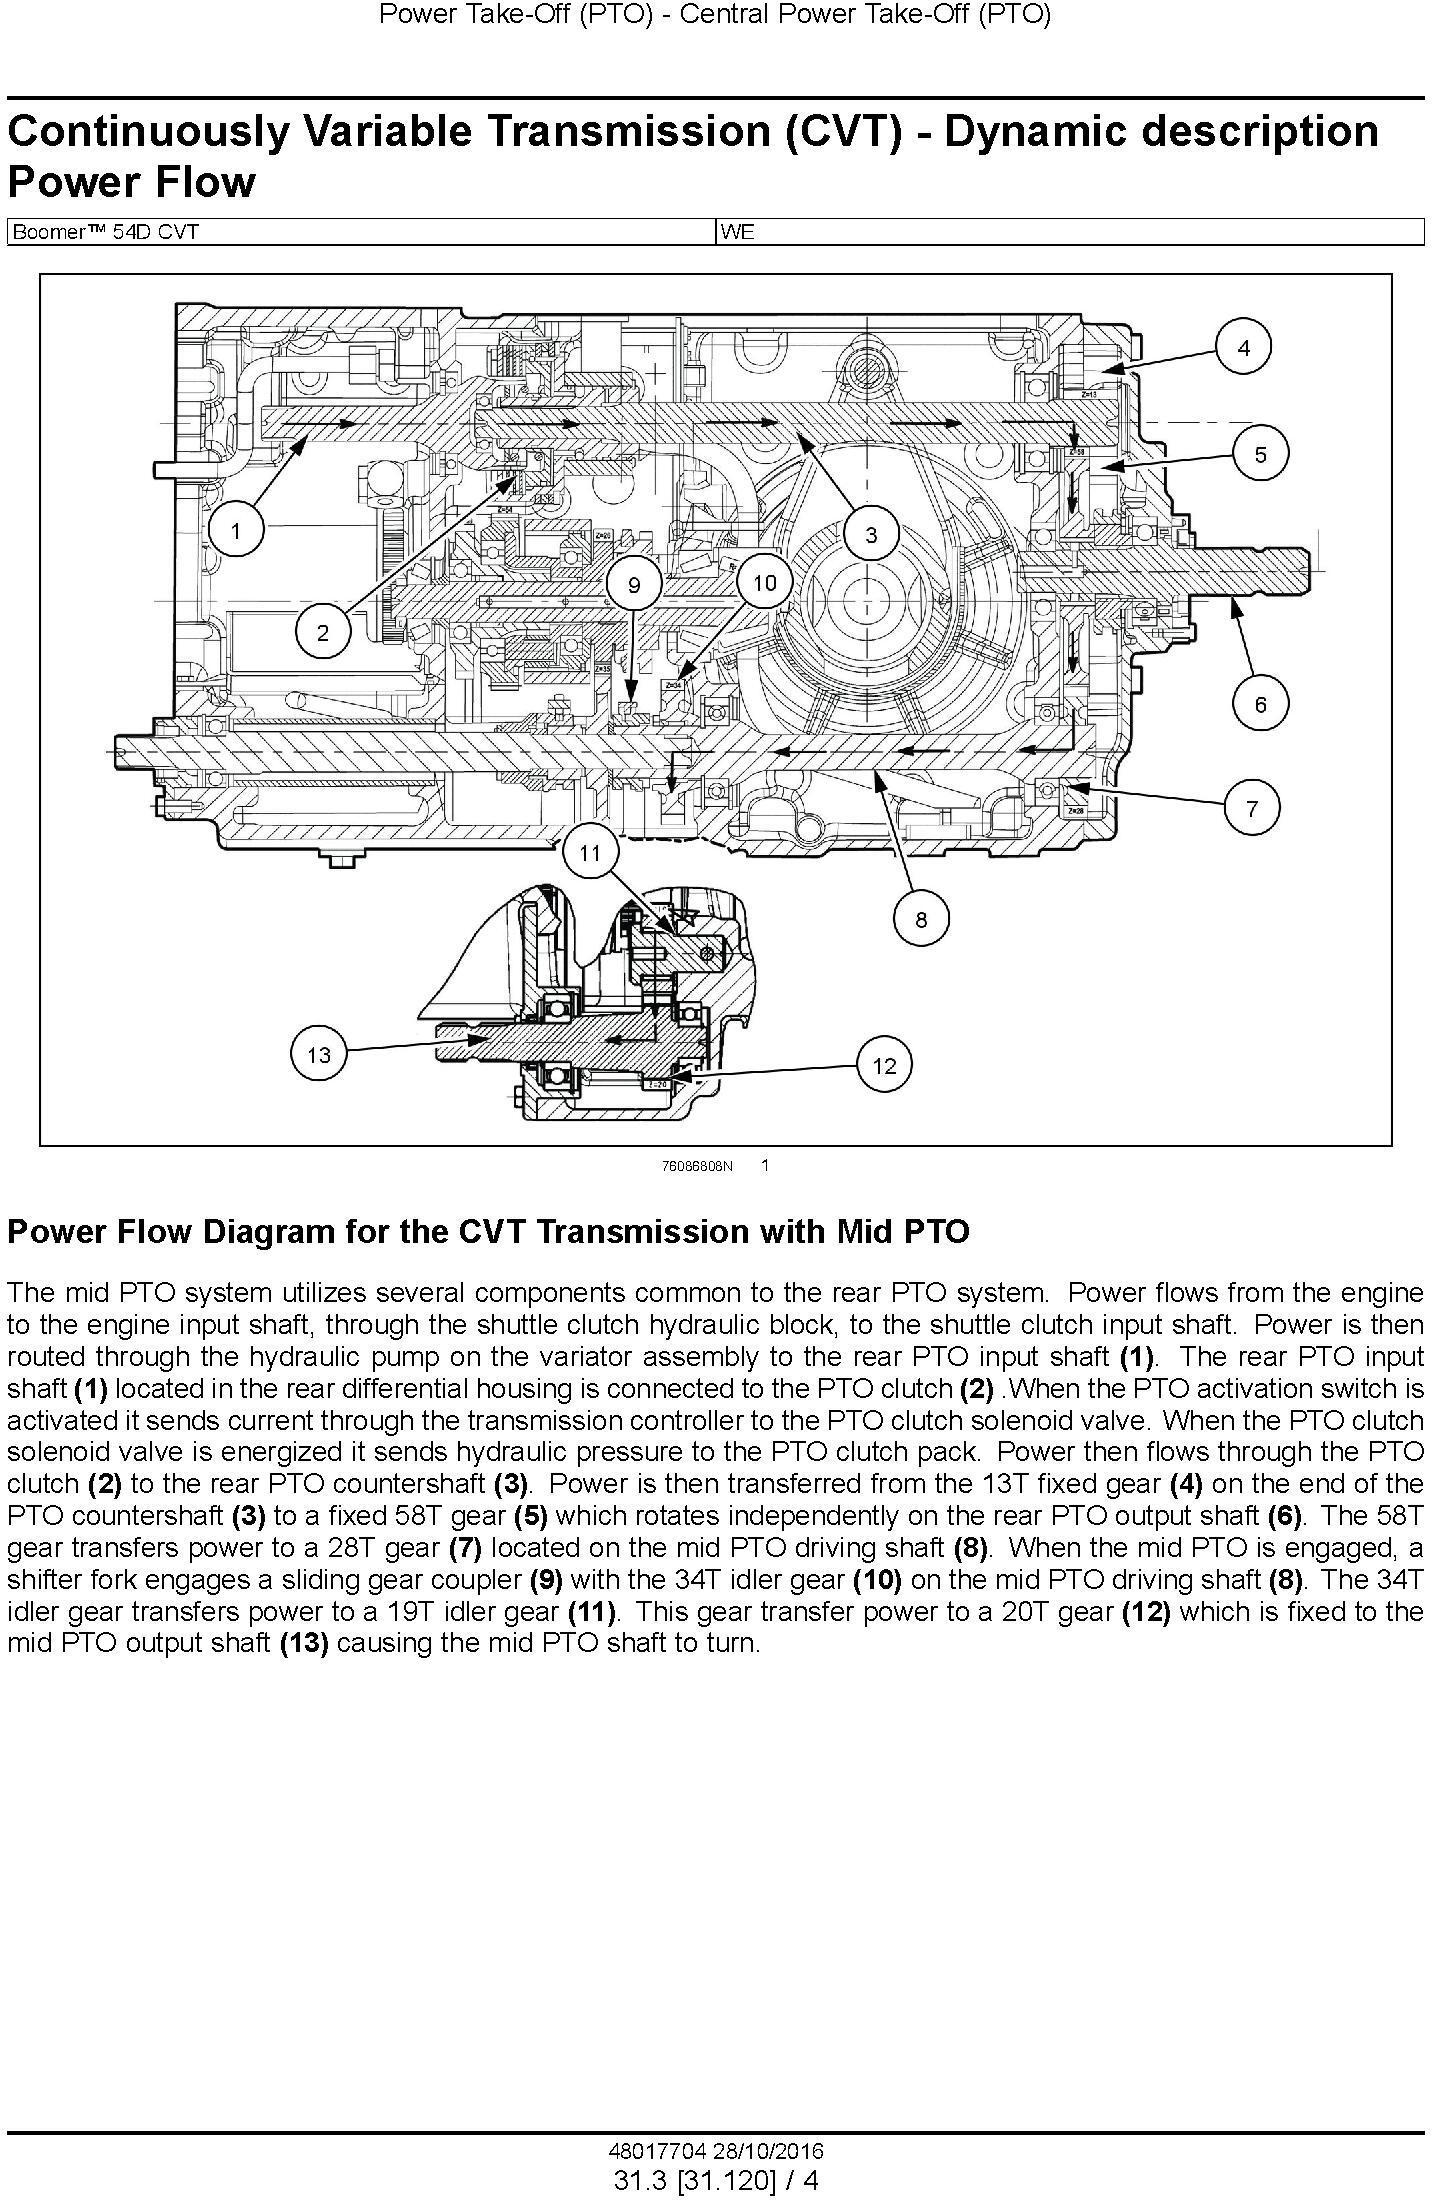 New Holland Boomer 54D CVT Tier 4B (final) Compact tractor Service Manual - 2